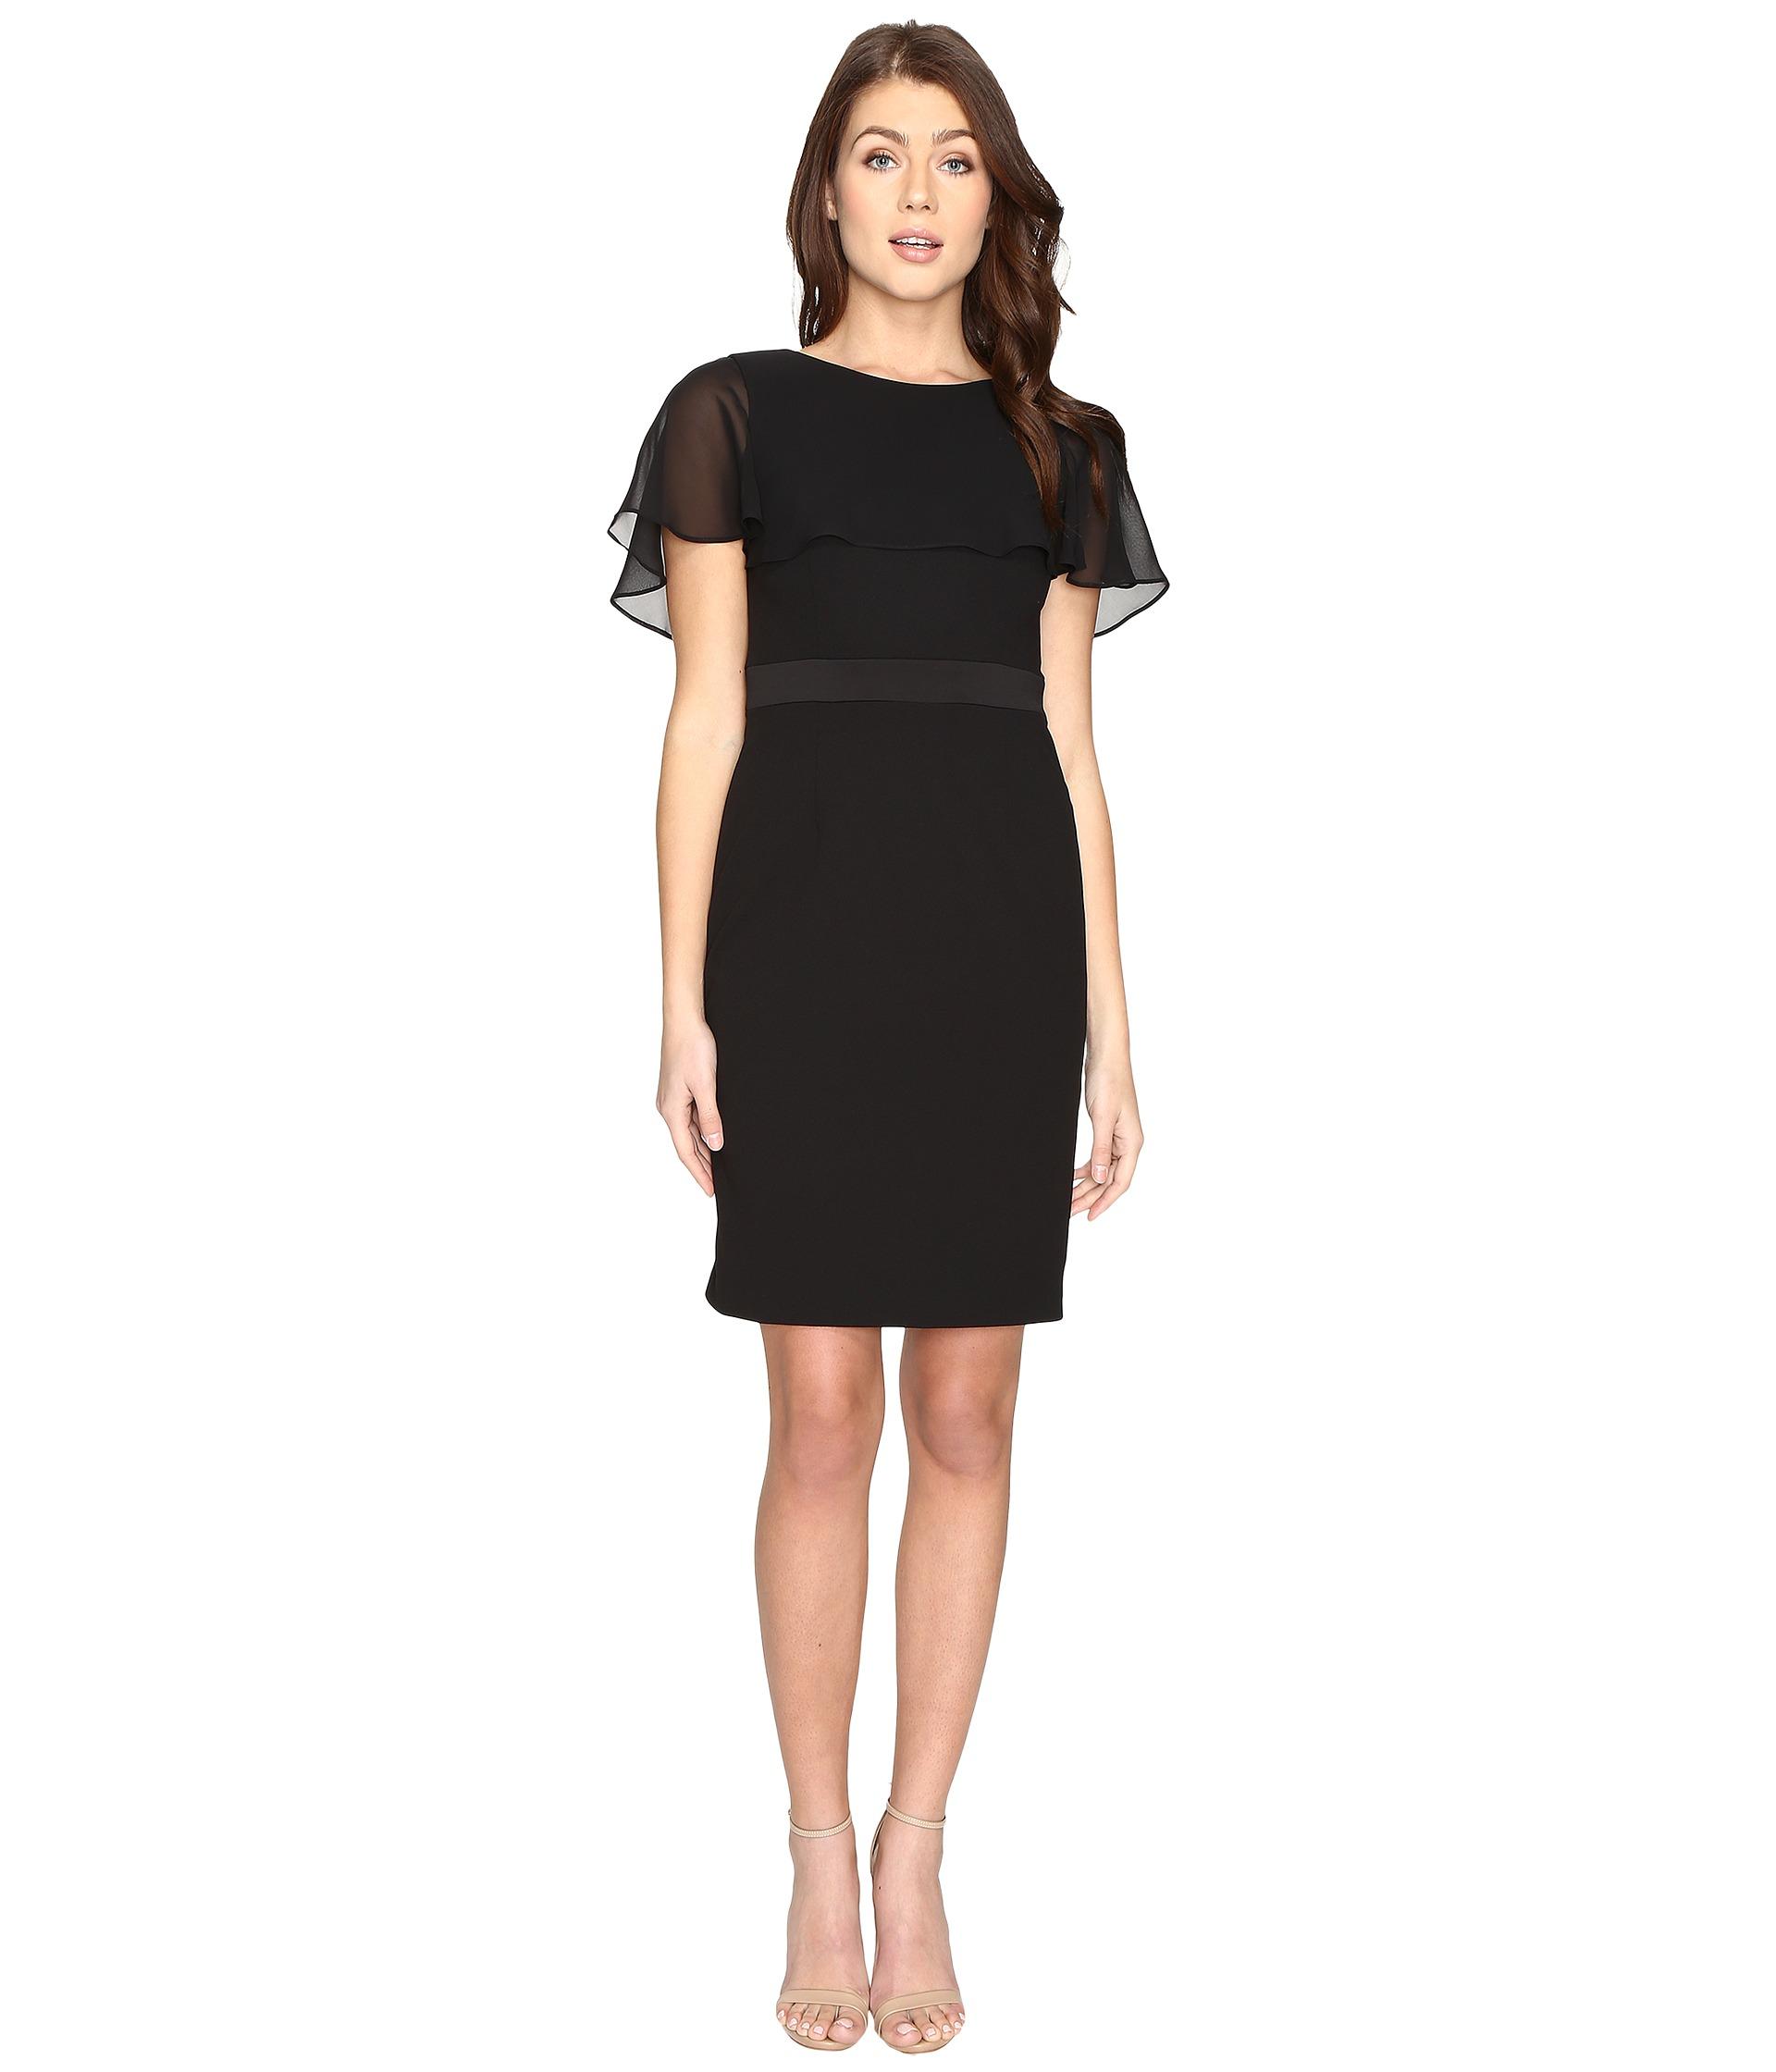 Black Chiffon Dress Black  Shipped Free at Zappos